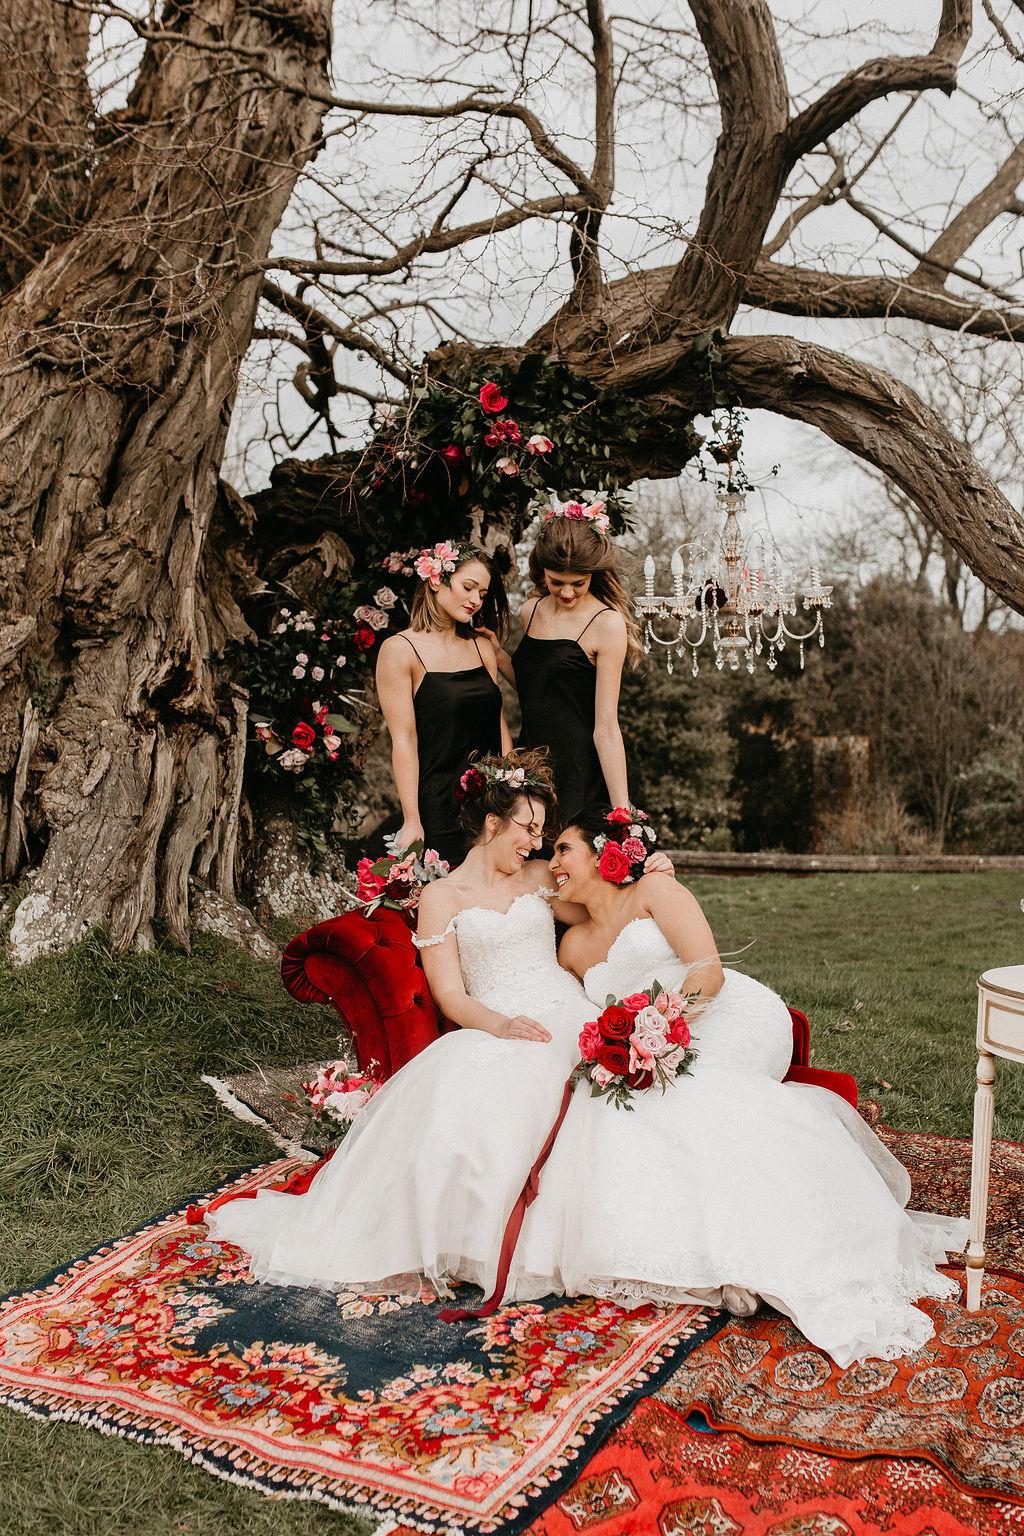 romantic woodland wedding - whimsical wedding- shakespeare wedding- unconventional wedding- romantic wedding photos